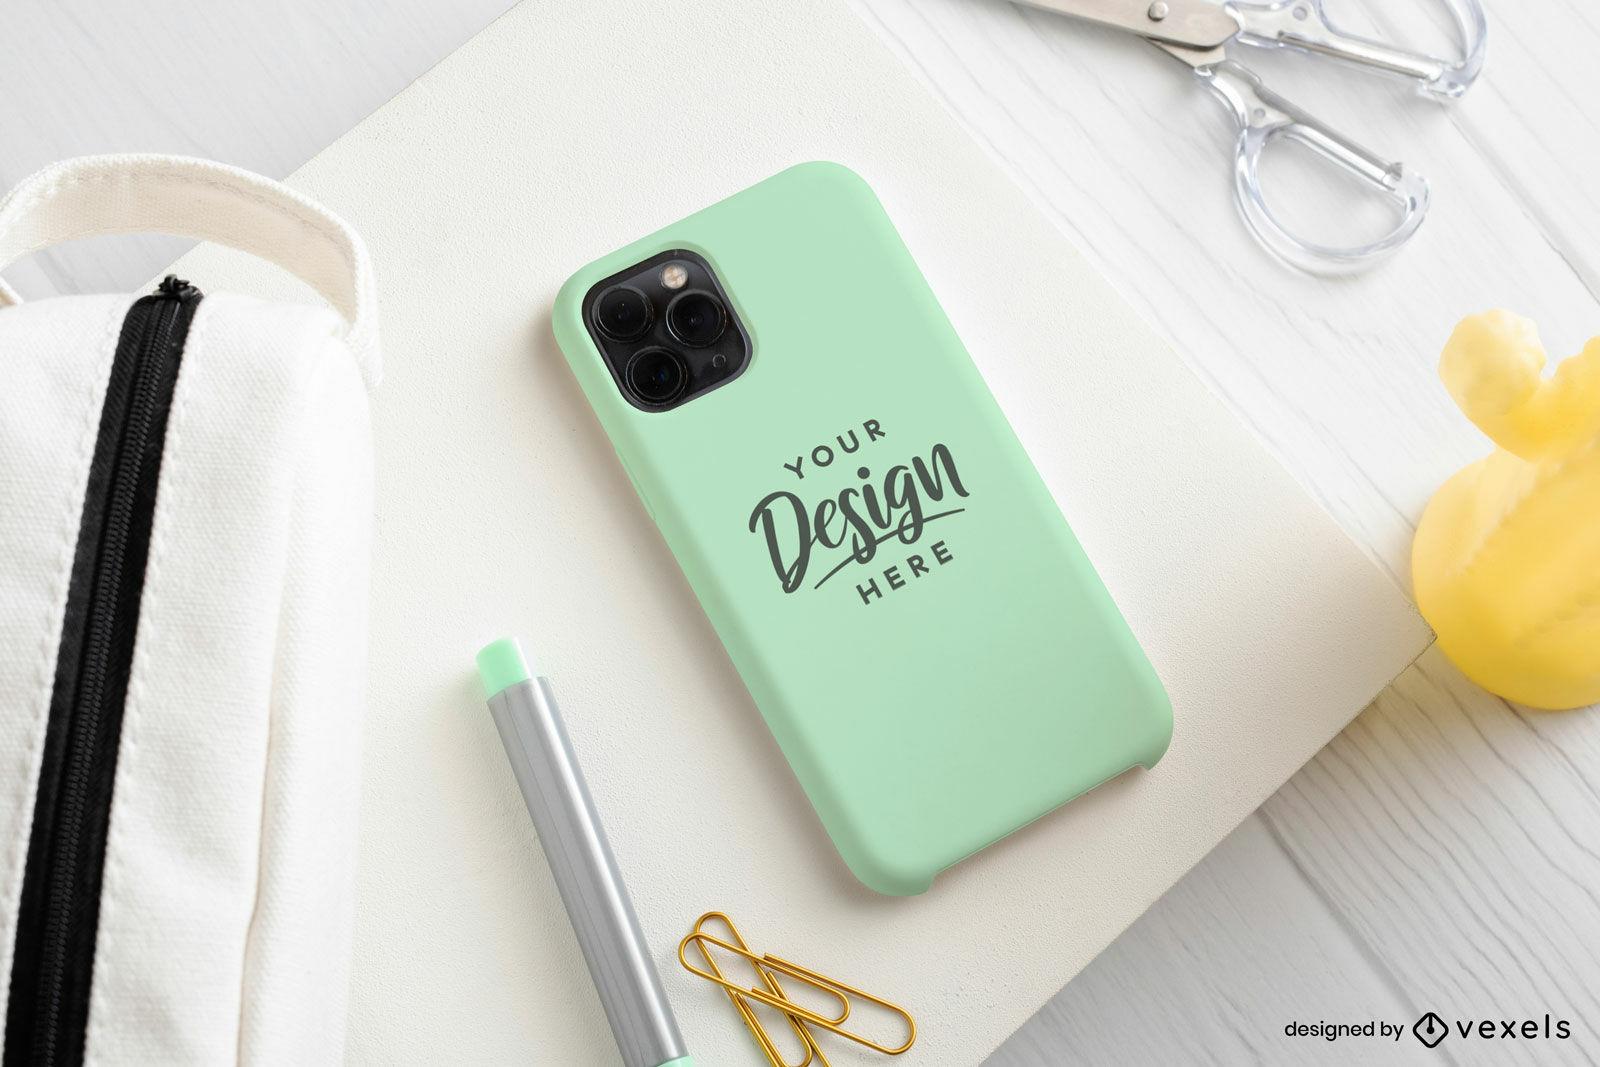 Maquete de capa de telefone verde claro na mesa